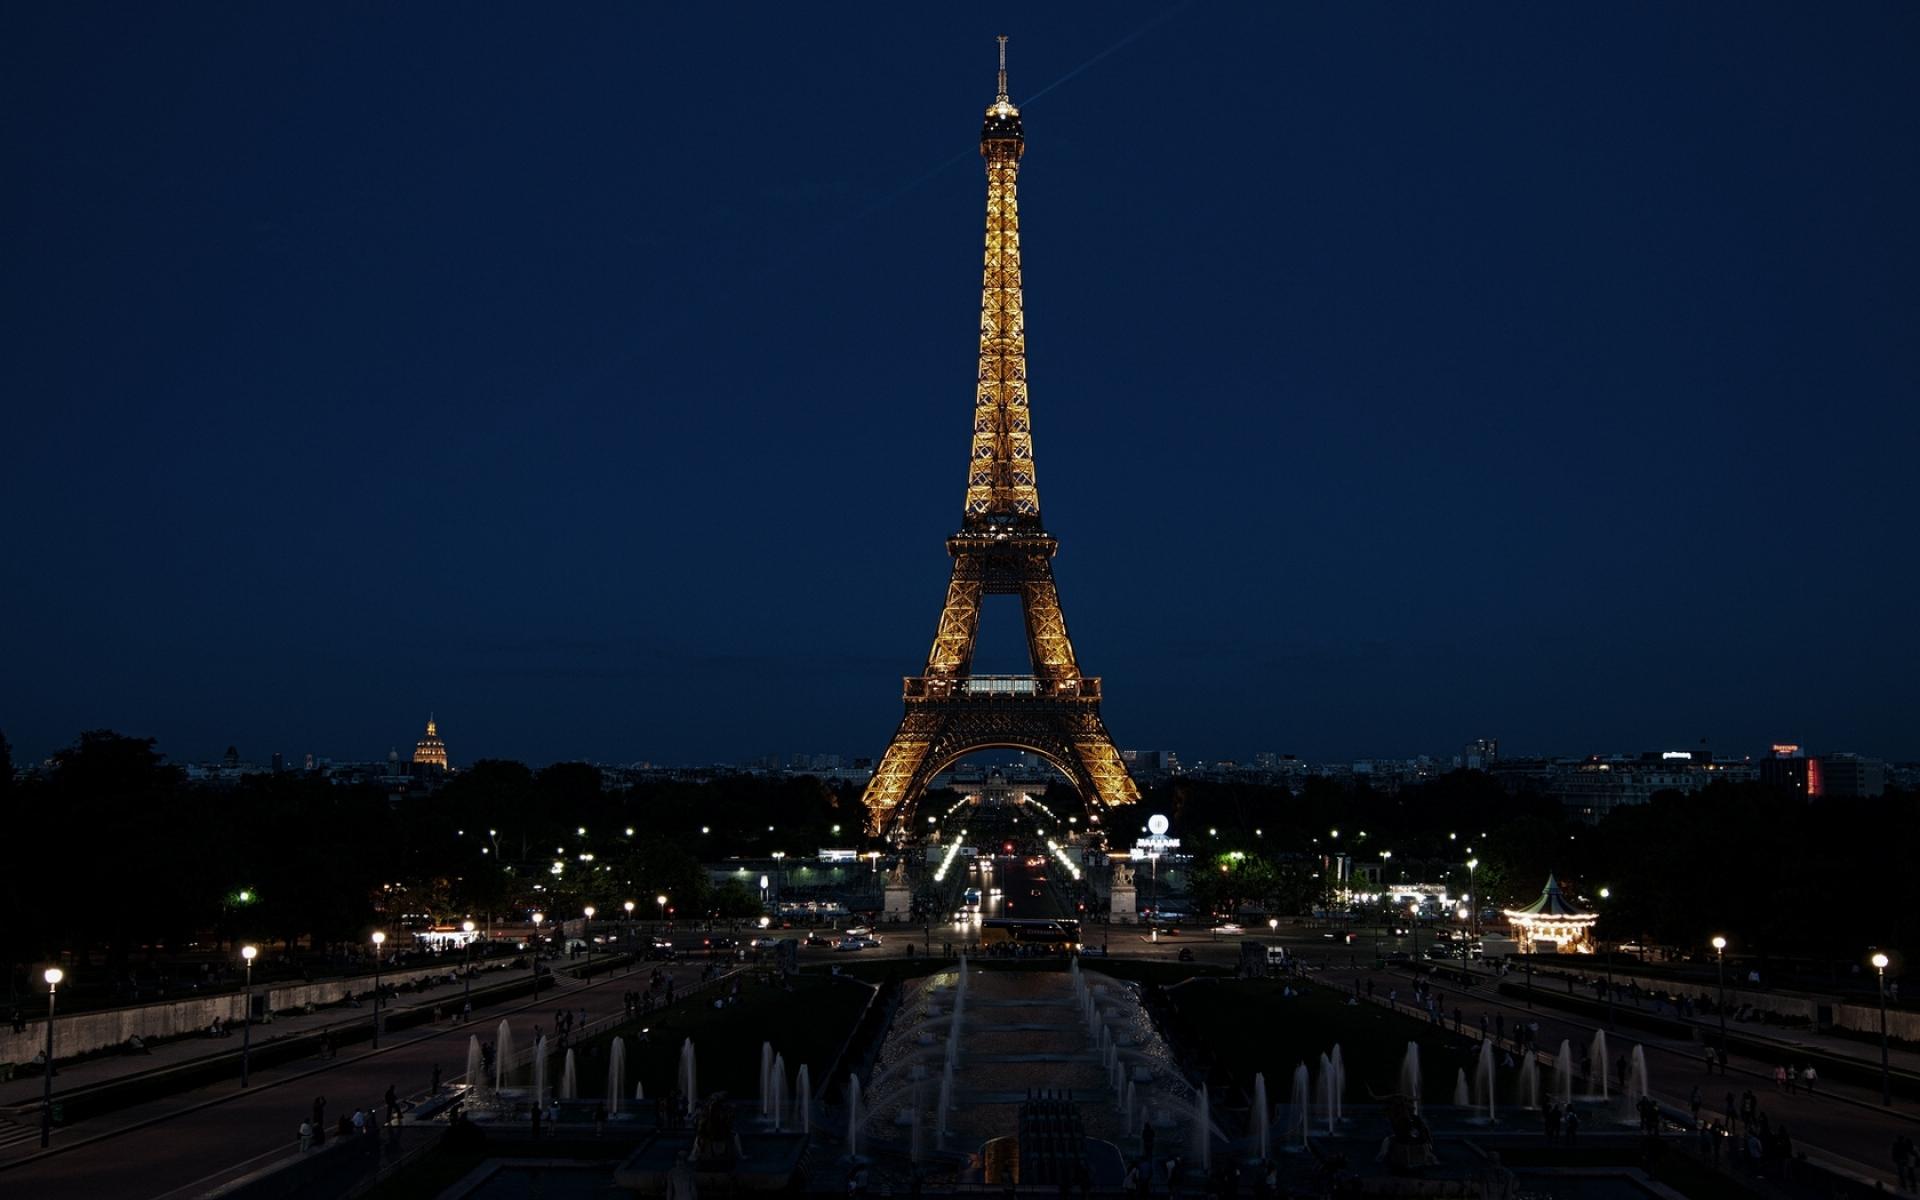 Картинки Париж, Франция, Эйфелева башня, город, ночь, огни фото и обои на рабочий стол